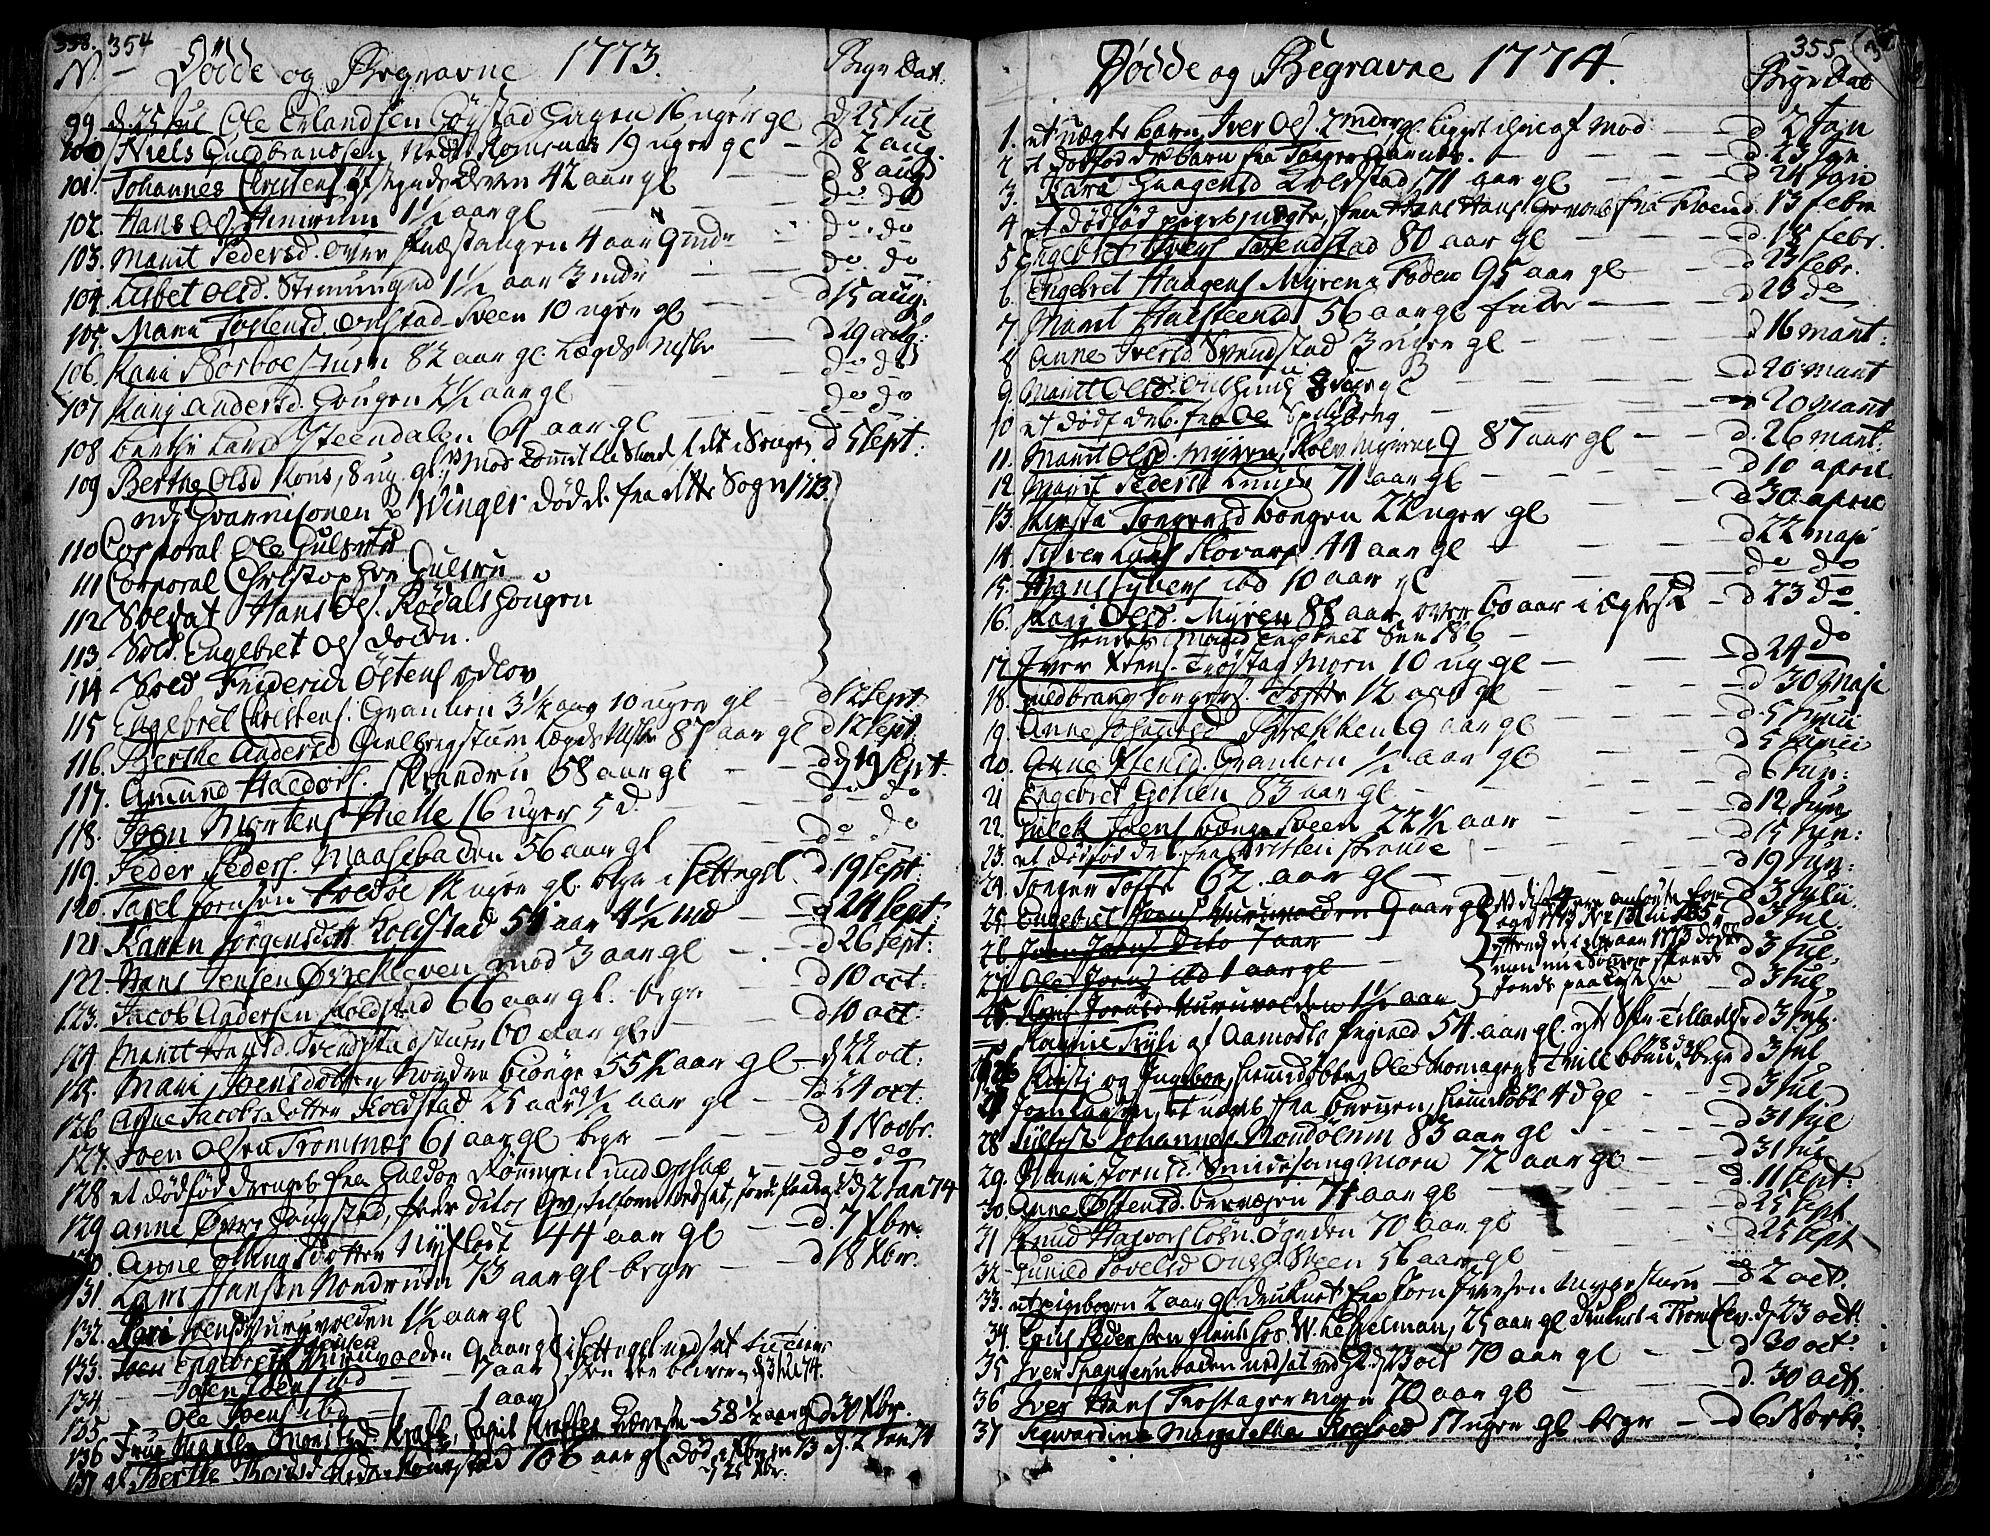 SAH, Ringebu prestekontor, Ministerialbok nr. 2, 1734-1780, s. 354-355